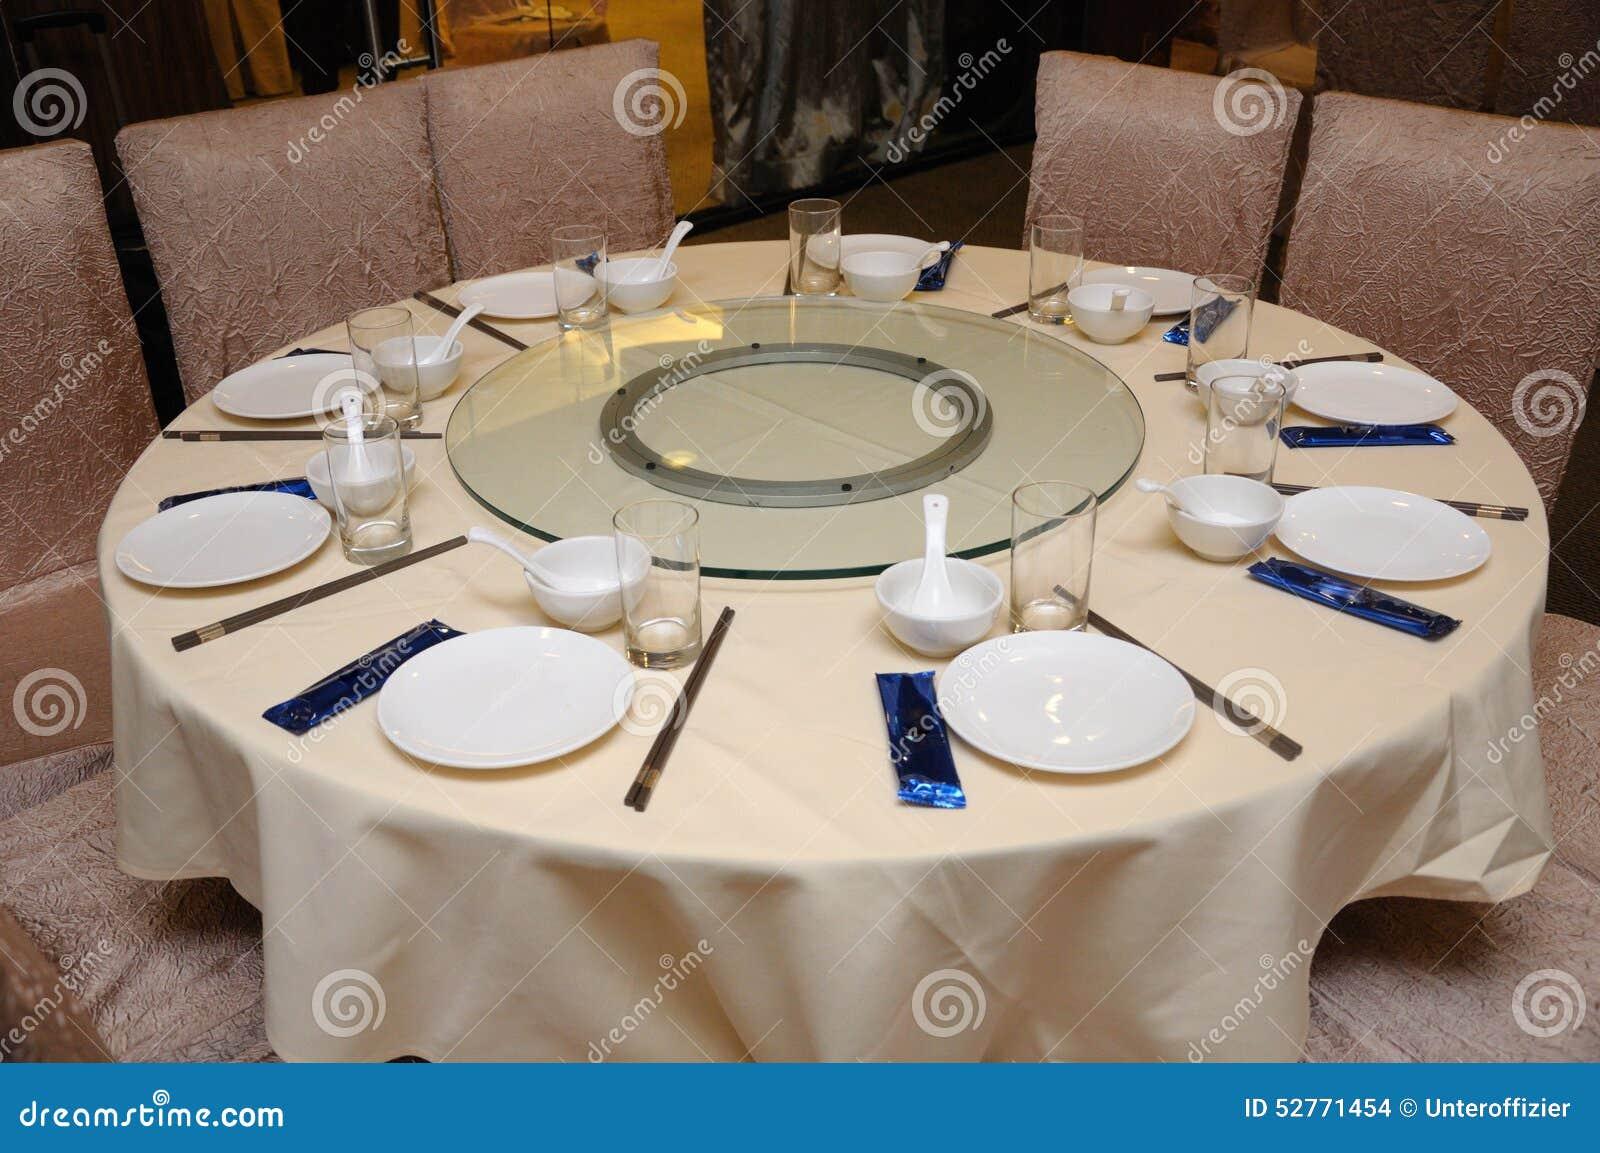 Oriental Restaurant Table Setting Stock Photo Image